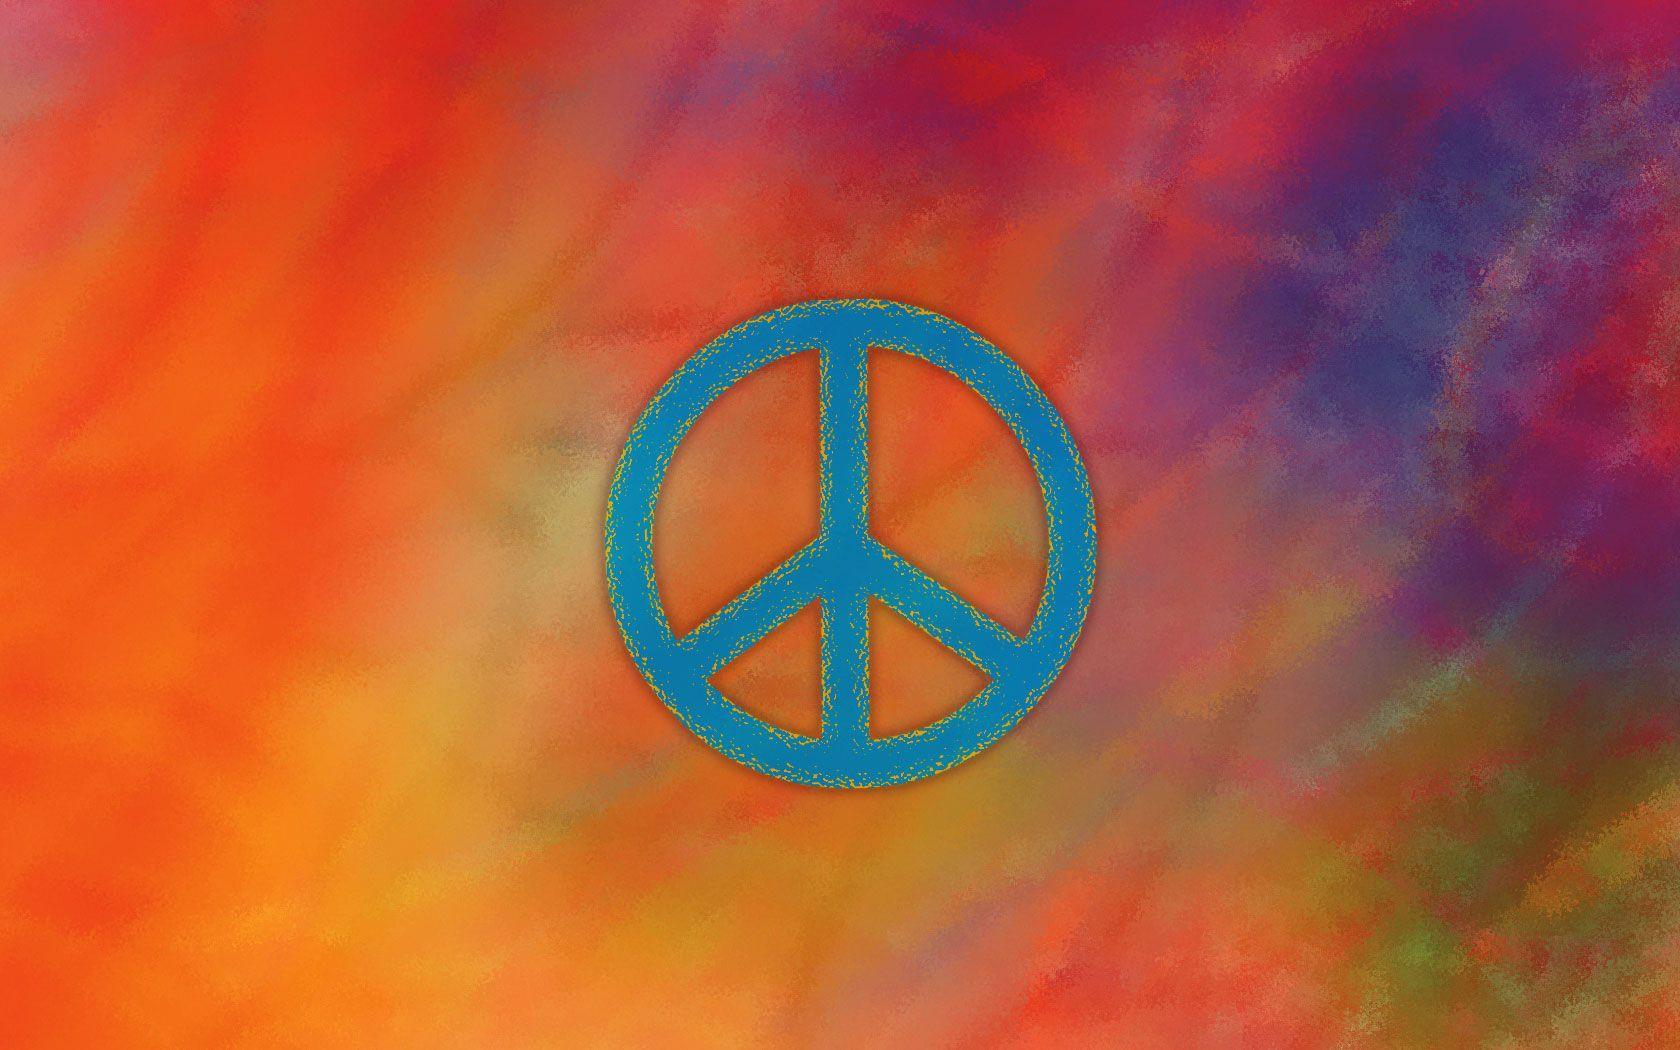 Yoga Symbols Wallpapers Top Free Yoga Symbols Backgrounds